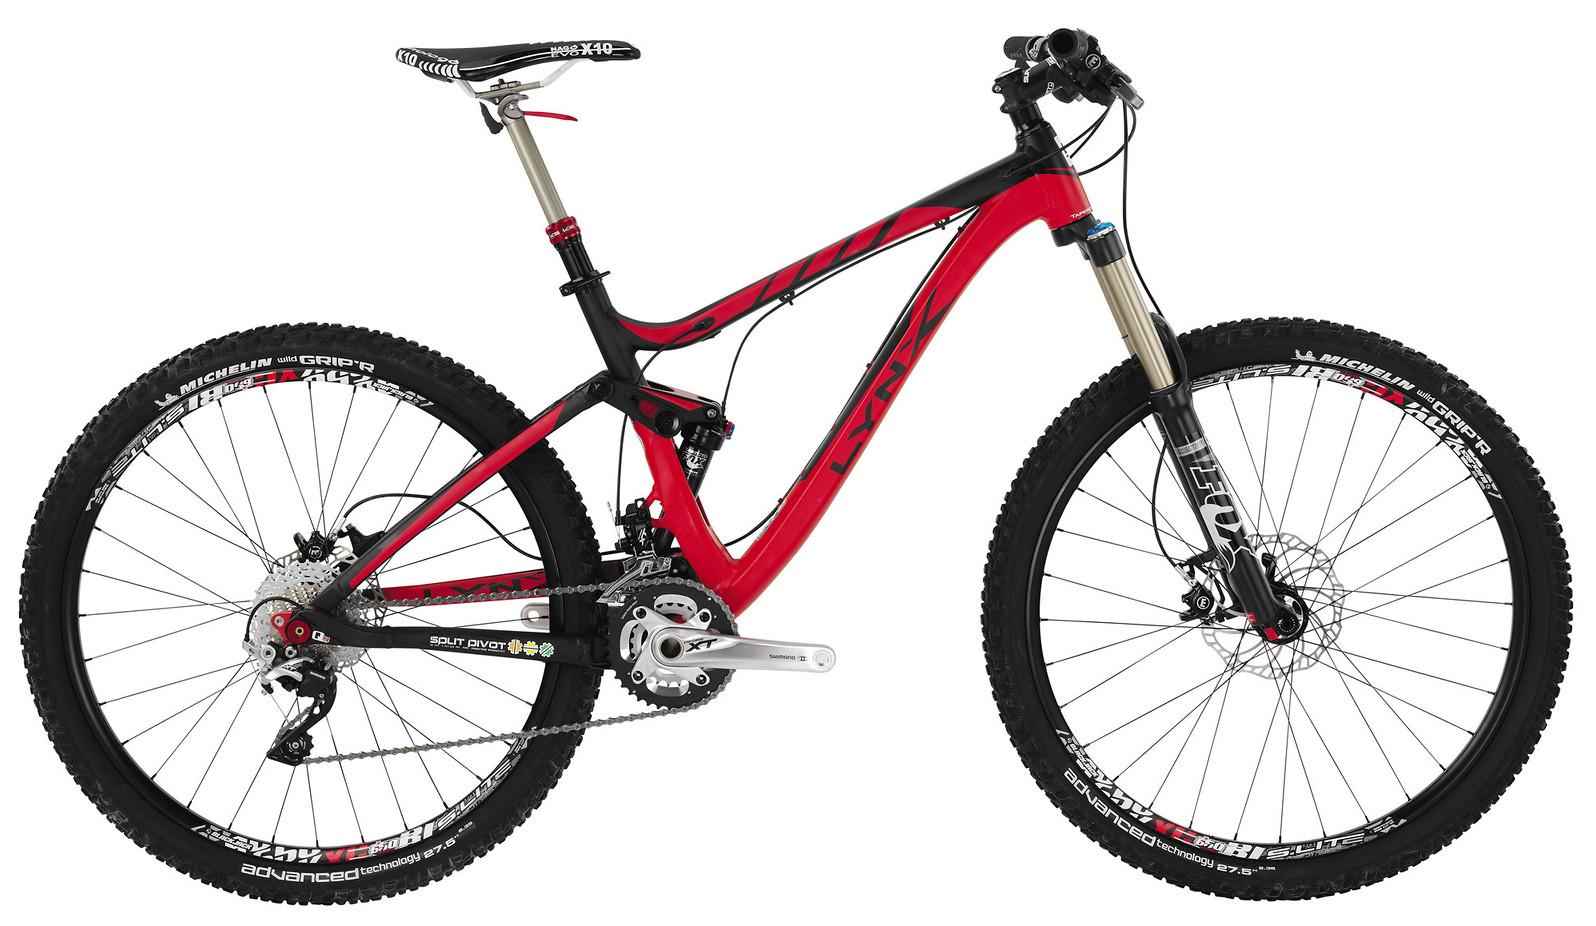 2014 BH Lynx 6 27.5er 8.7 Alu Bike